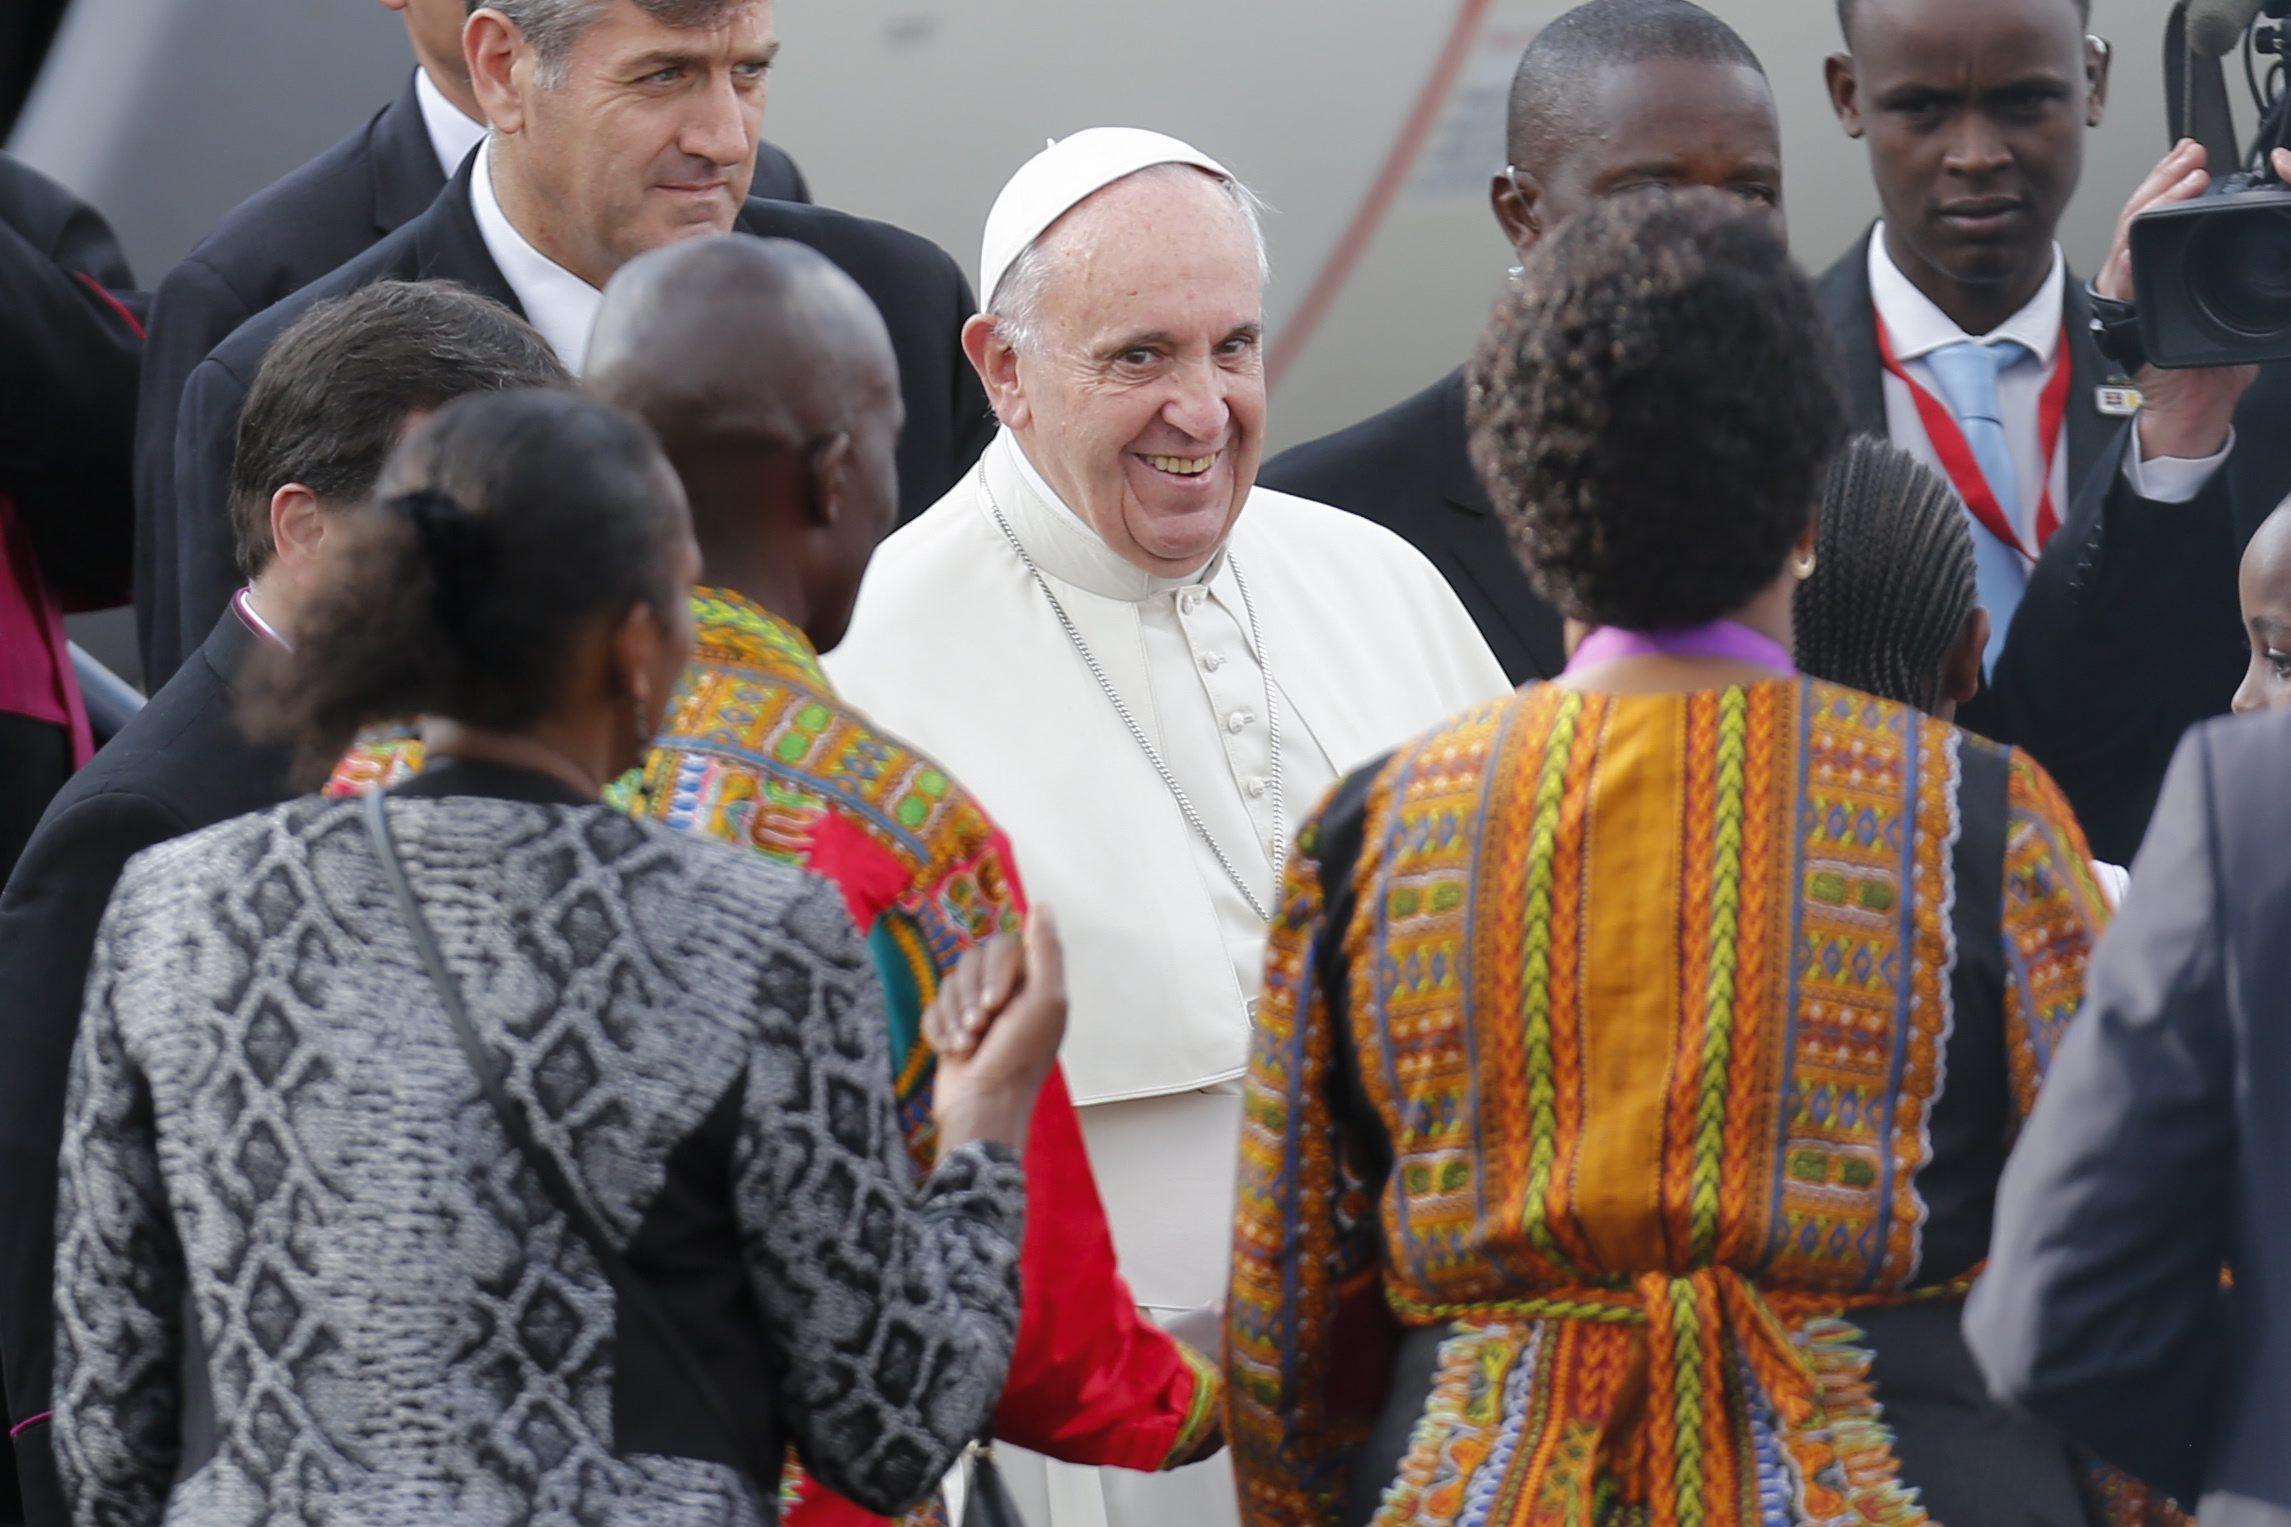 Pope Francis at his arrival at Jomo Kenyatta International Airport in Nairobi